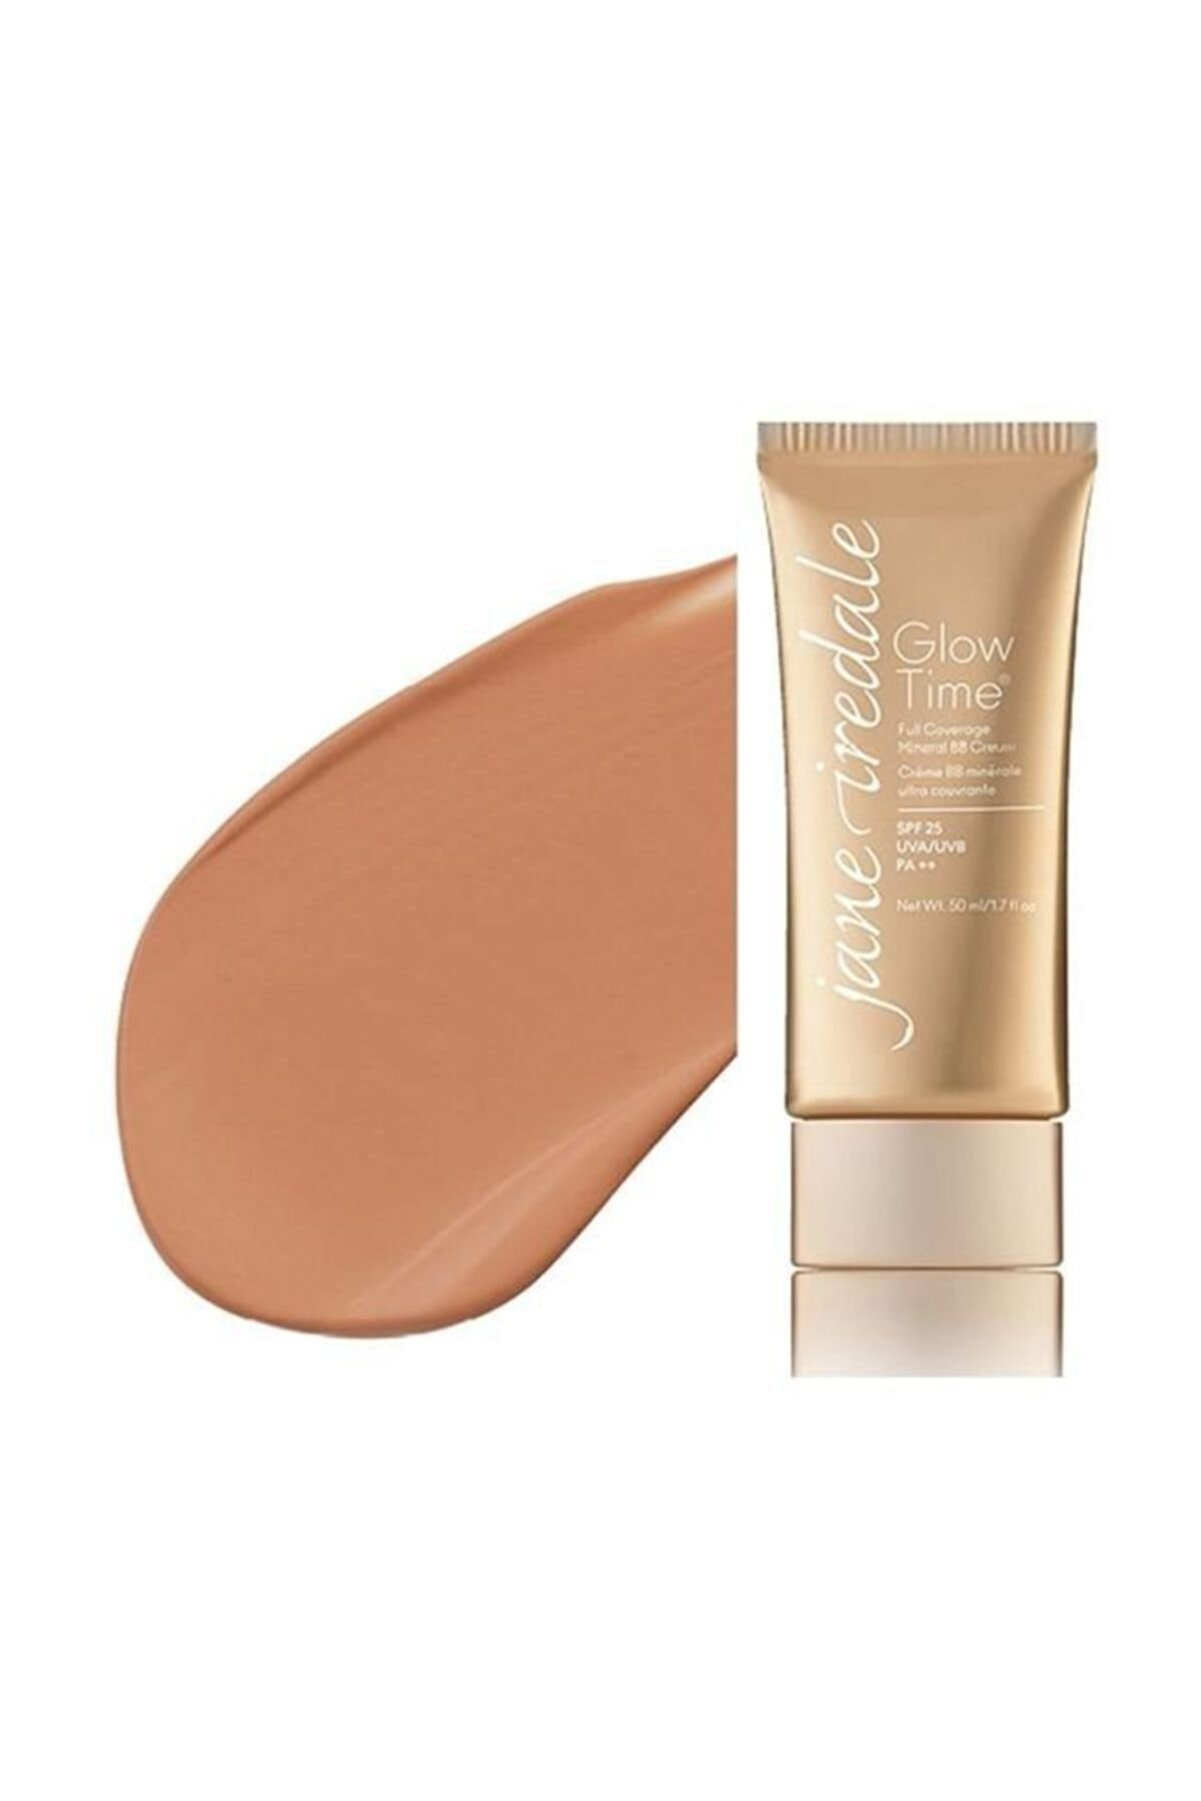 Jane Iredale Mineral BB Kapatıcı - Glow Time Full Covarage Mineral BB Cream Spf 25 BB8 50 ml 670959113313